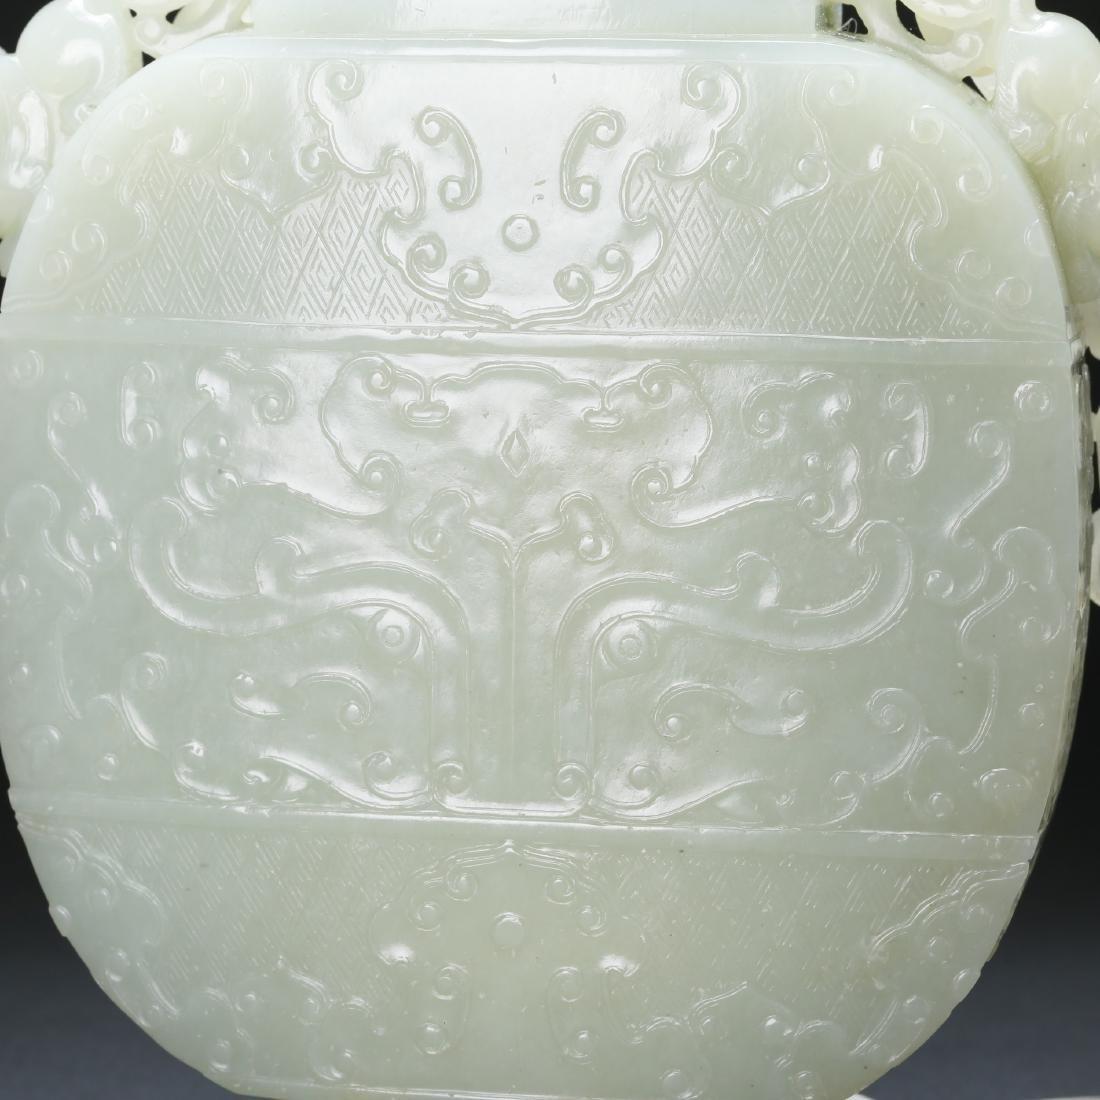 CHINESE CELADON WHITE JADE CHAIN VASE - 8